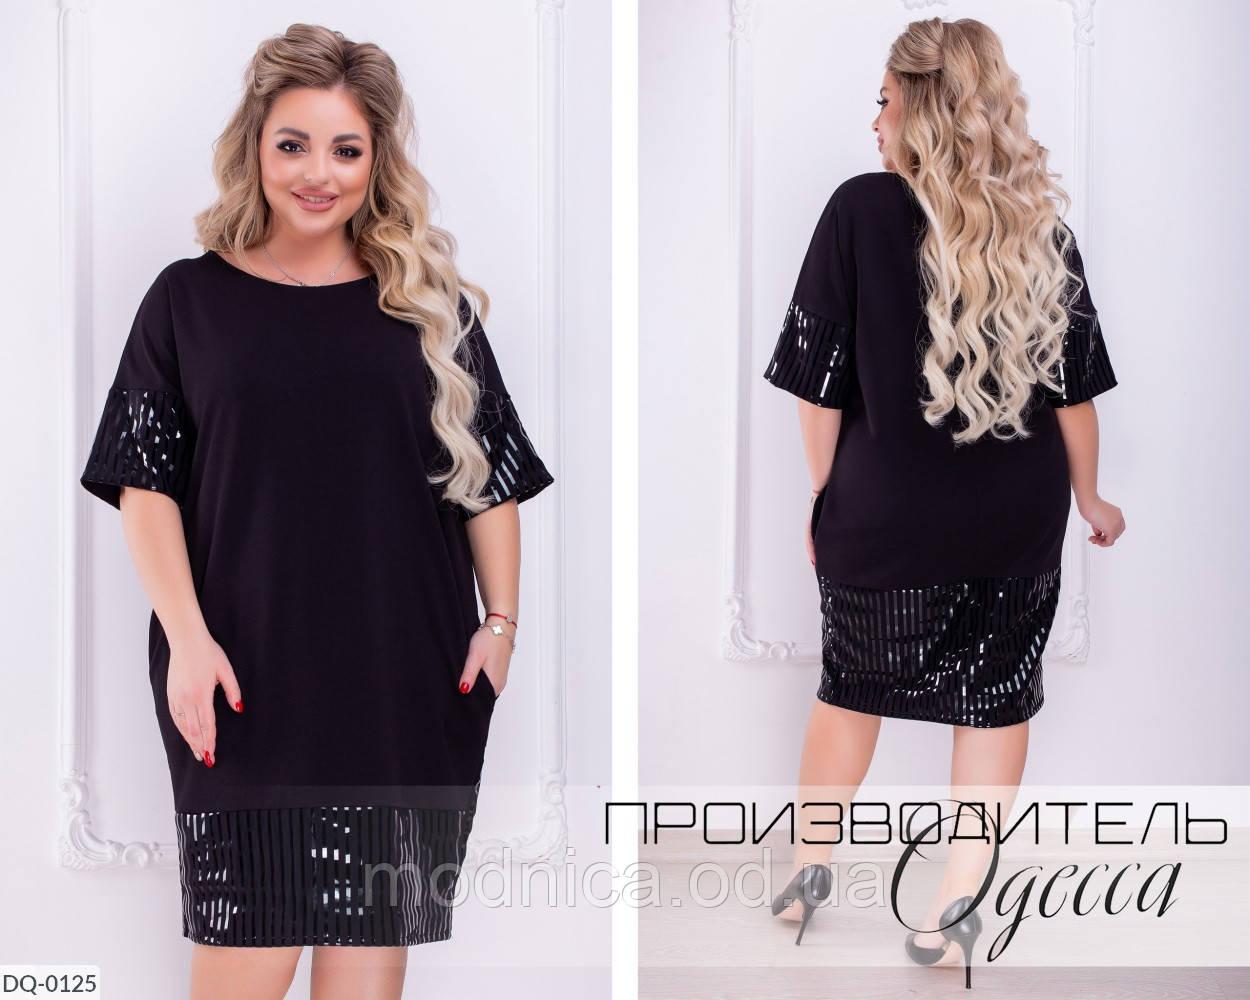 Женское платье-баллон большого размера, размеры 50-52, 54-56, 58-60